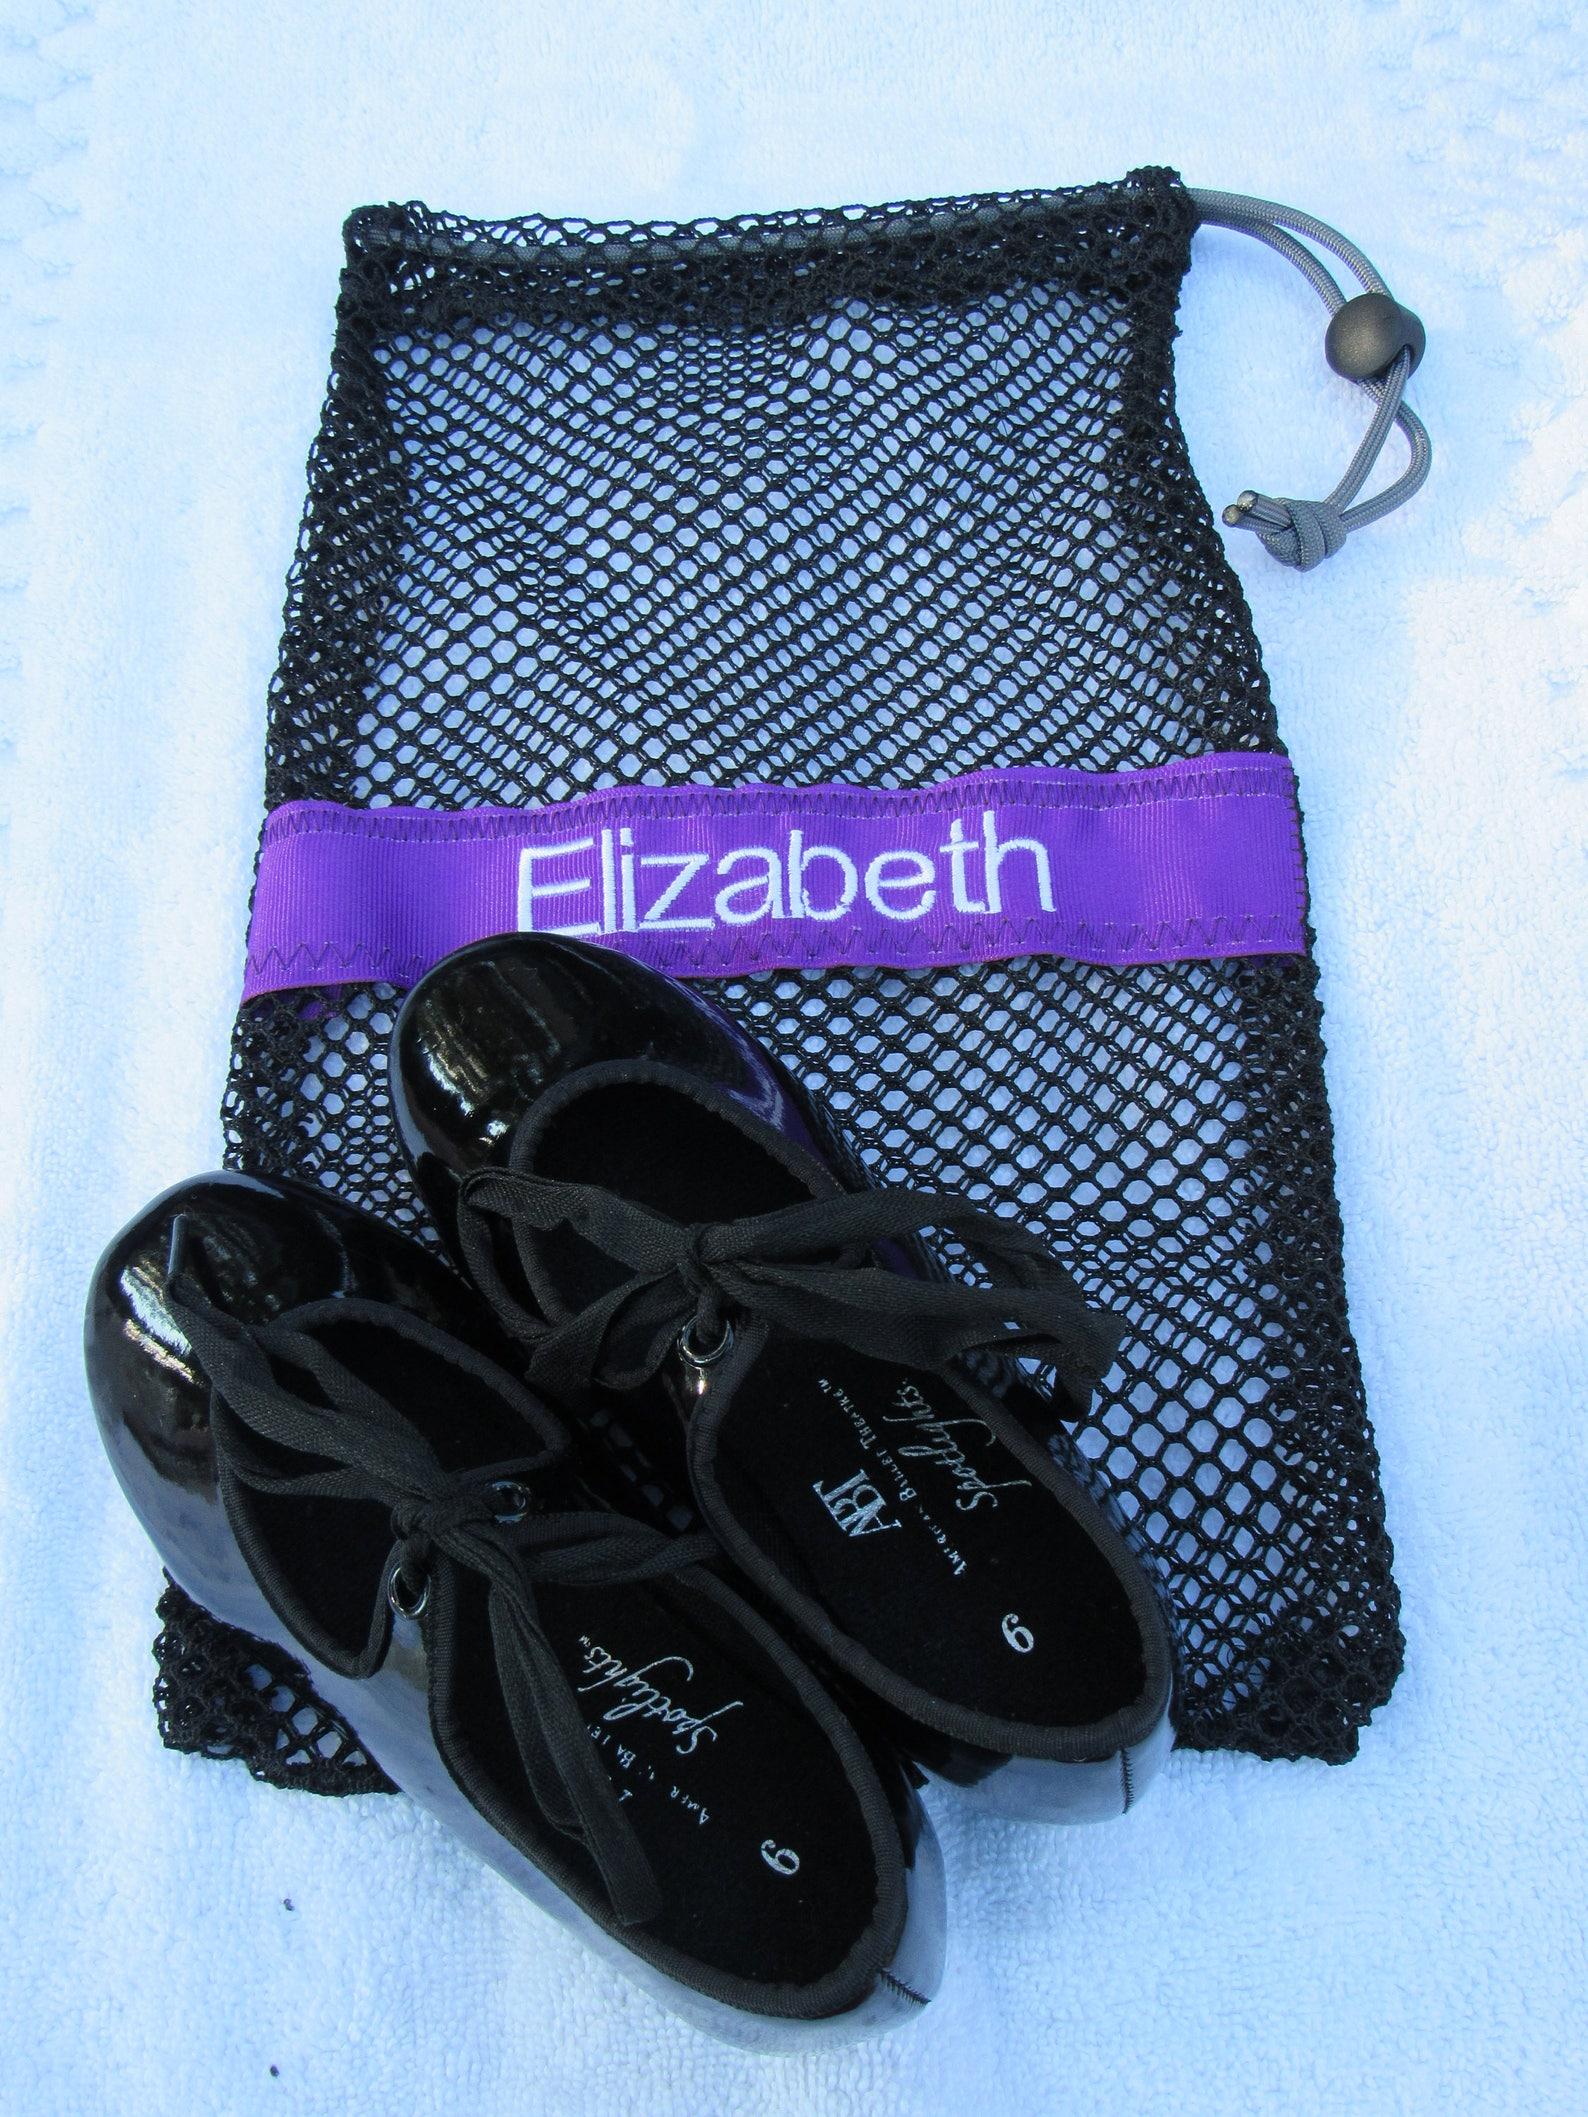 mesh drawstring black small ballet jazz tap pointe shoe glove ditty bag; free shipping within usa; dance team cheer softball gif